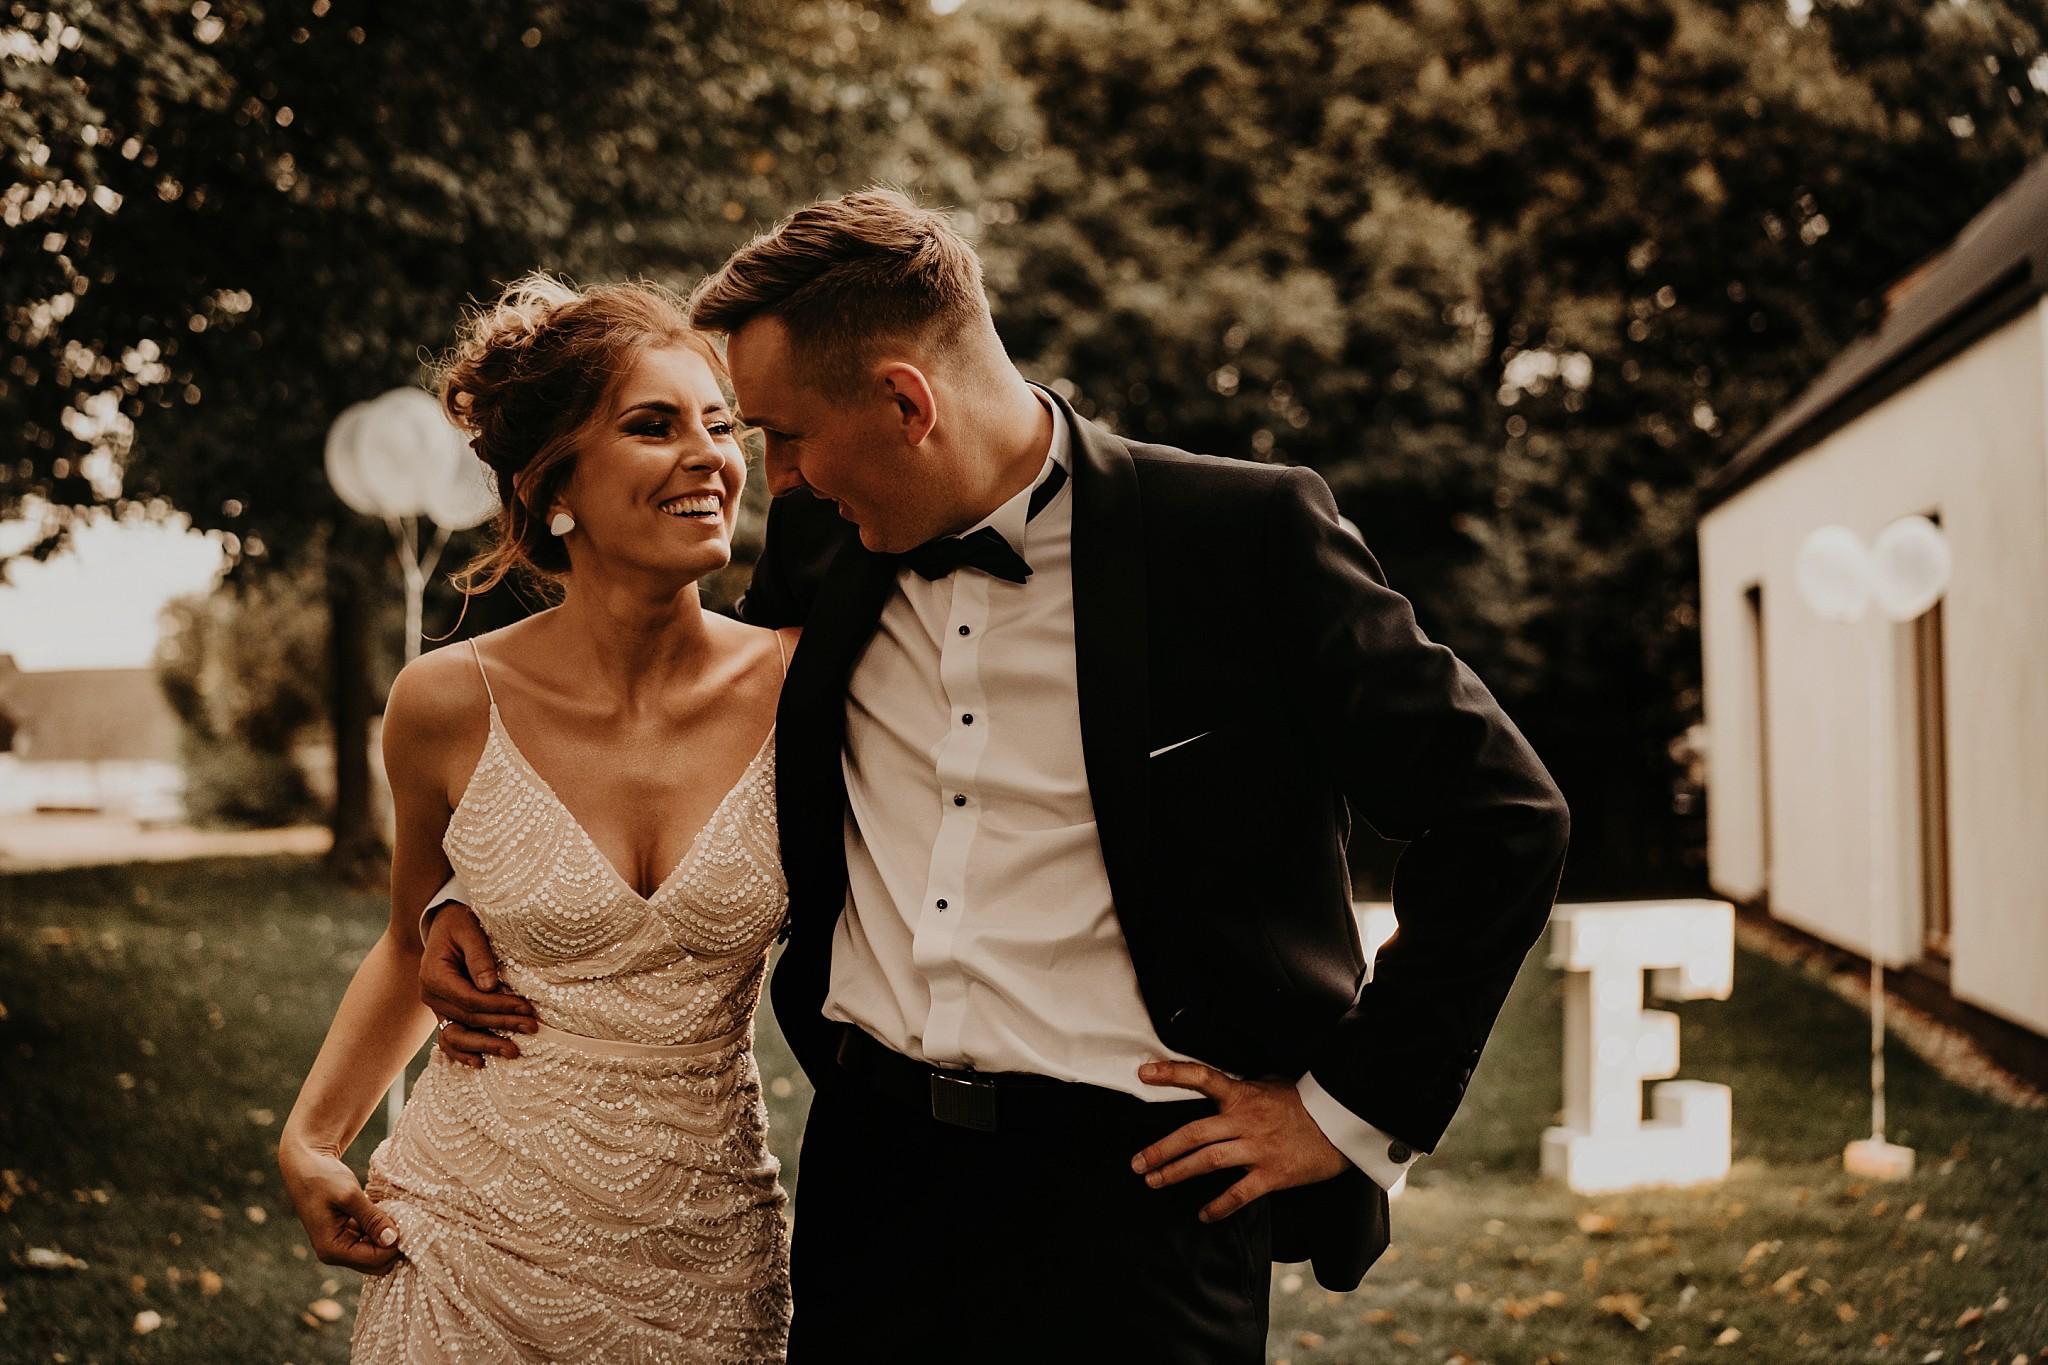 fotograf poznan wesele dobra truskawka piekne wesele pod poznaniem wesele w dobrej truskawce piekna para mloda slub marzen slub koronawirus slub listopad wesele koronawirus 356